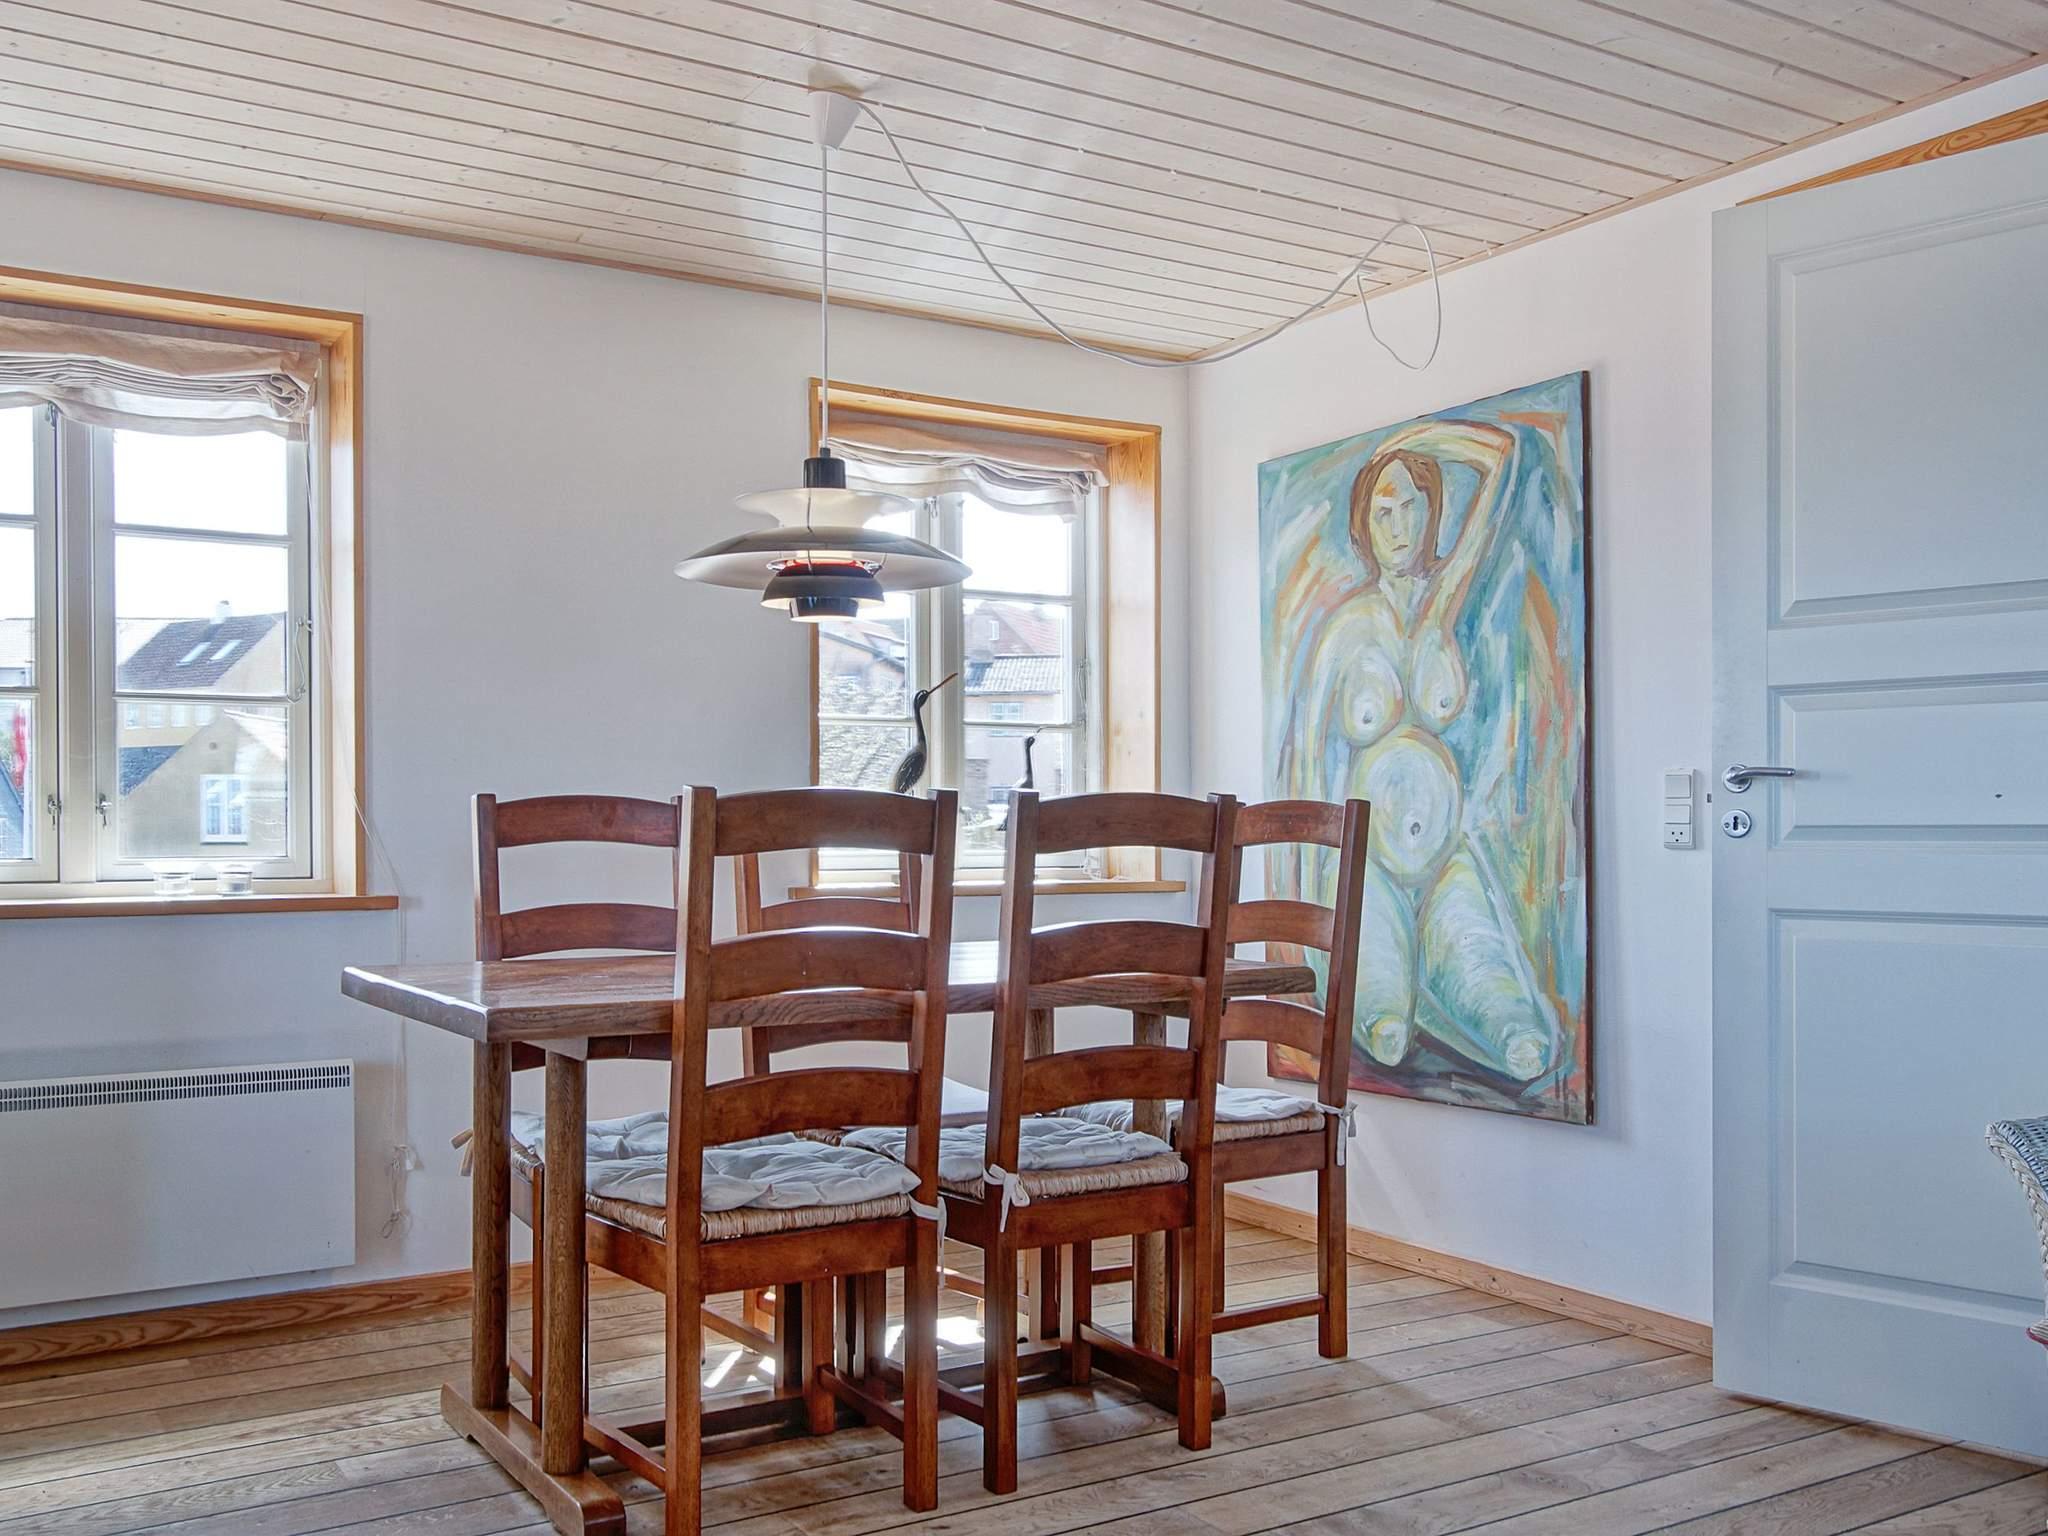 Ferienwohnung Gudhjem (2523817), Gudhjem, , Bornholm, Dänemark, Bild 3